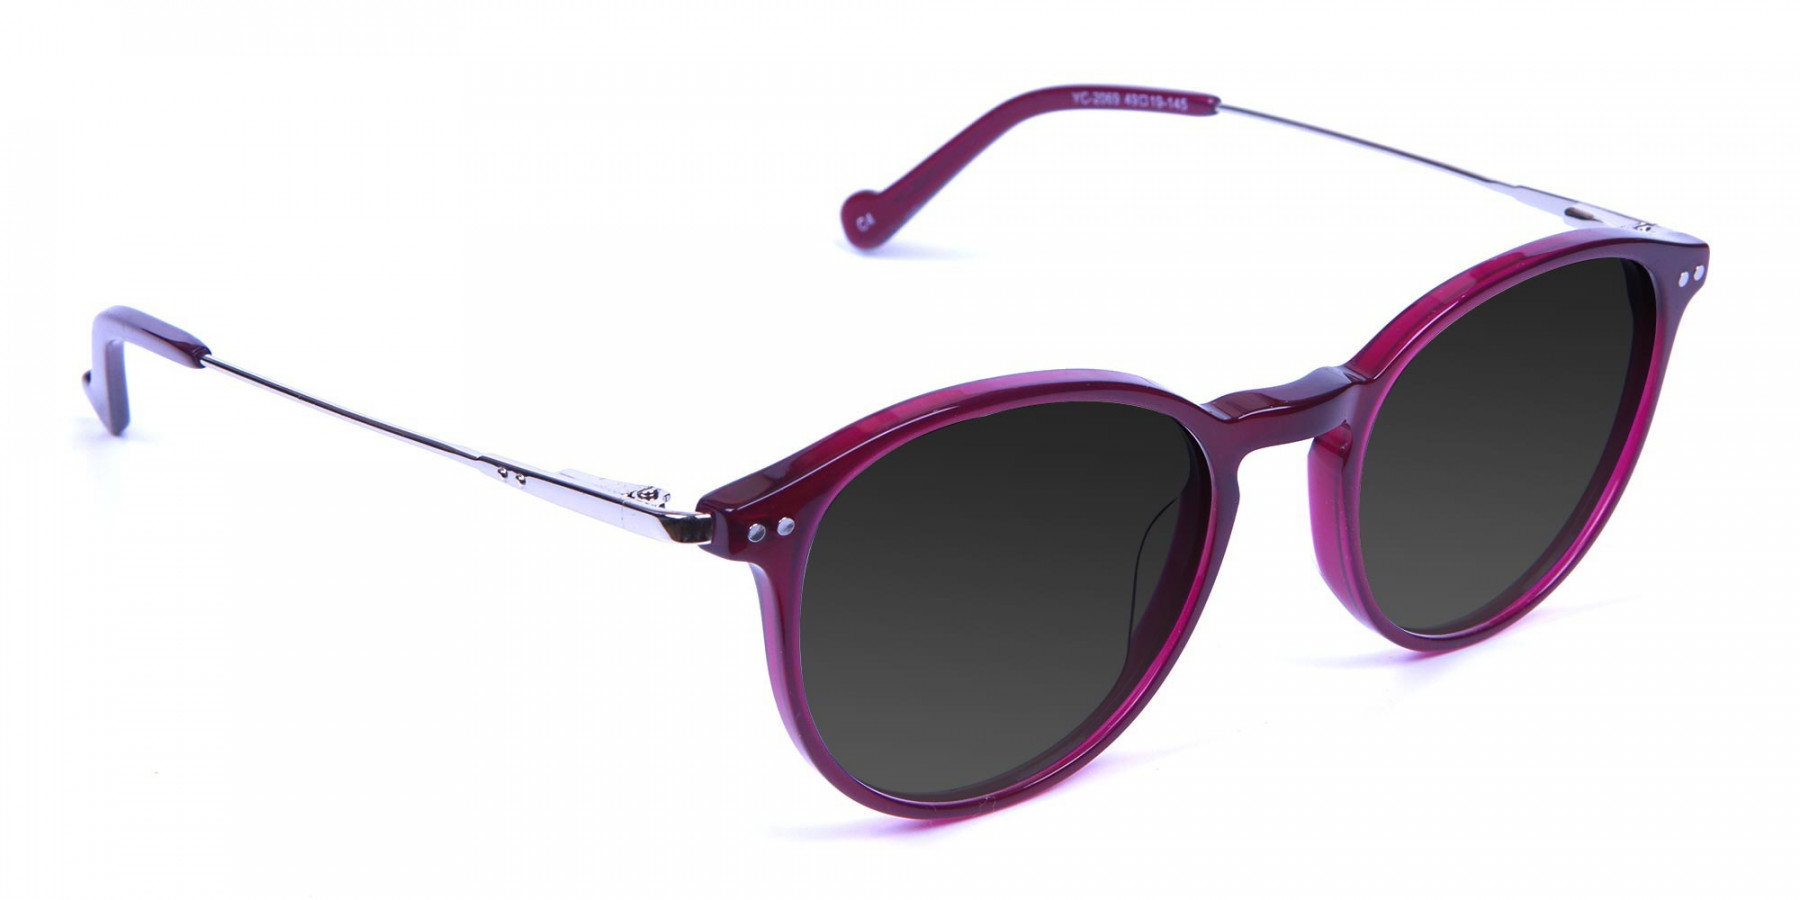 Burgundy Sunglasses - 3